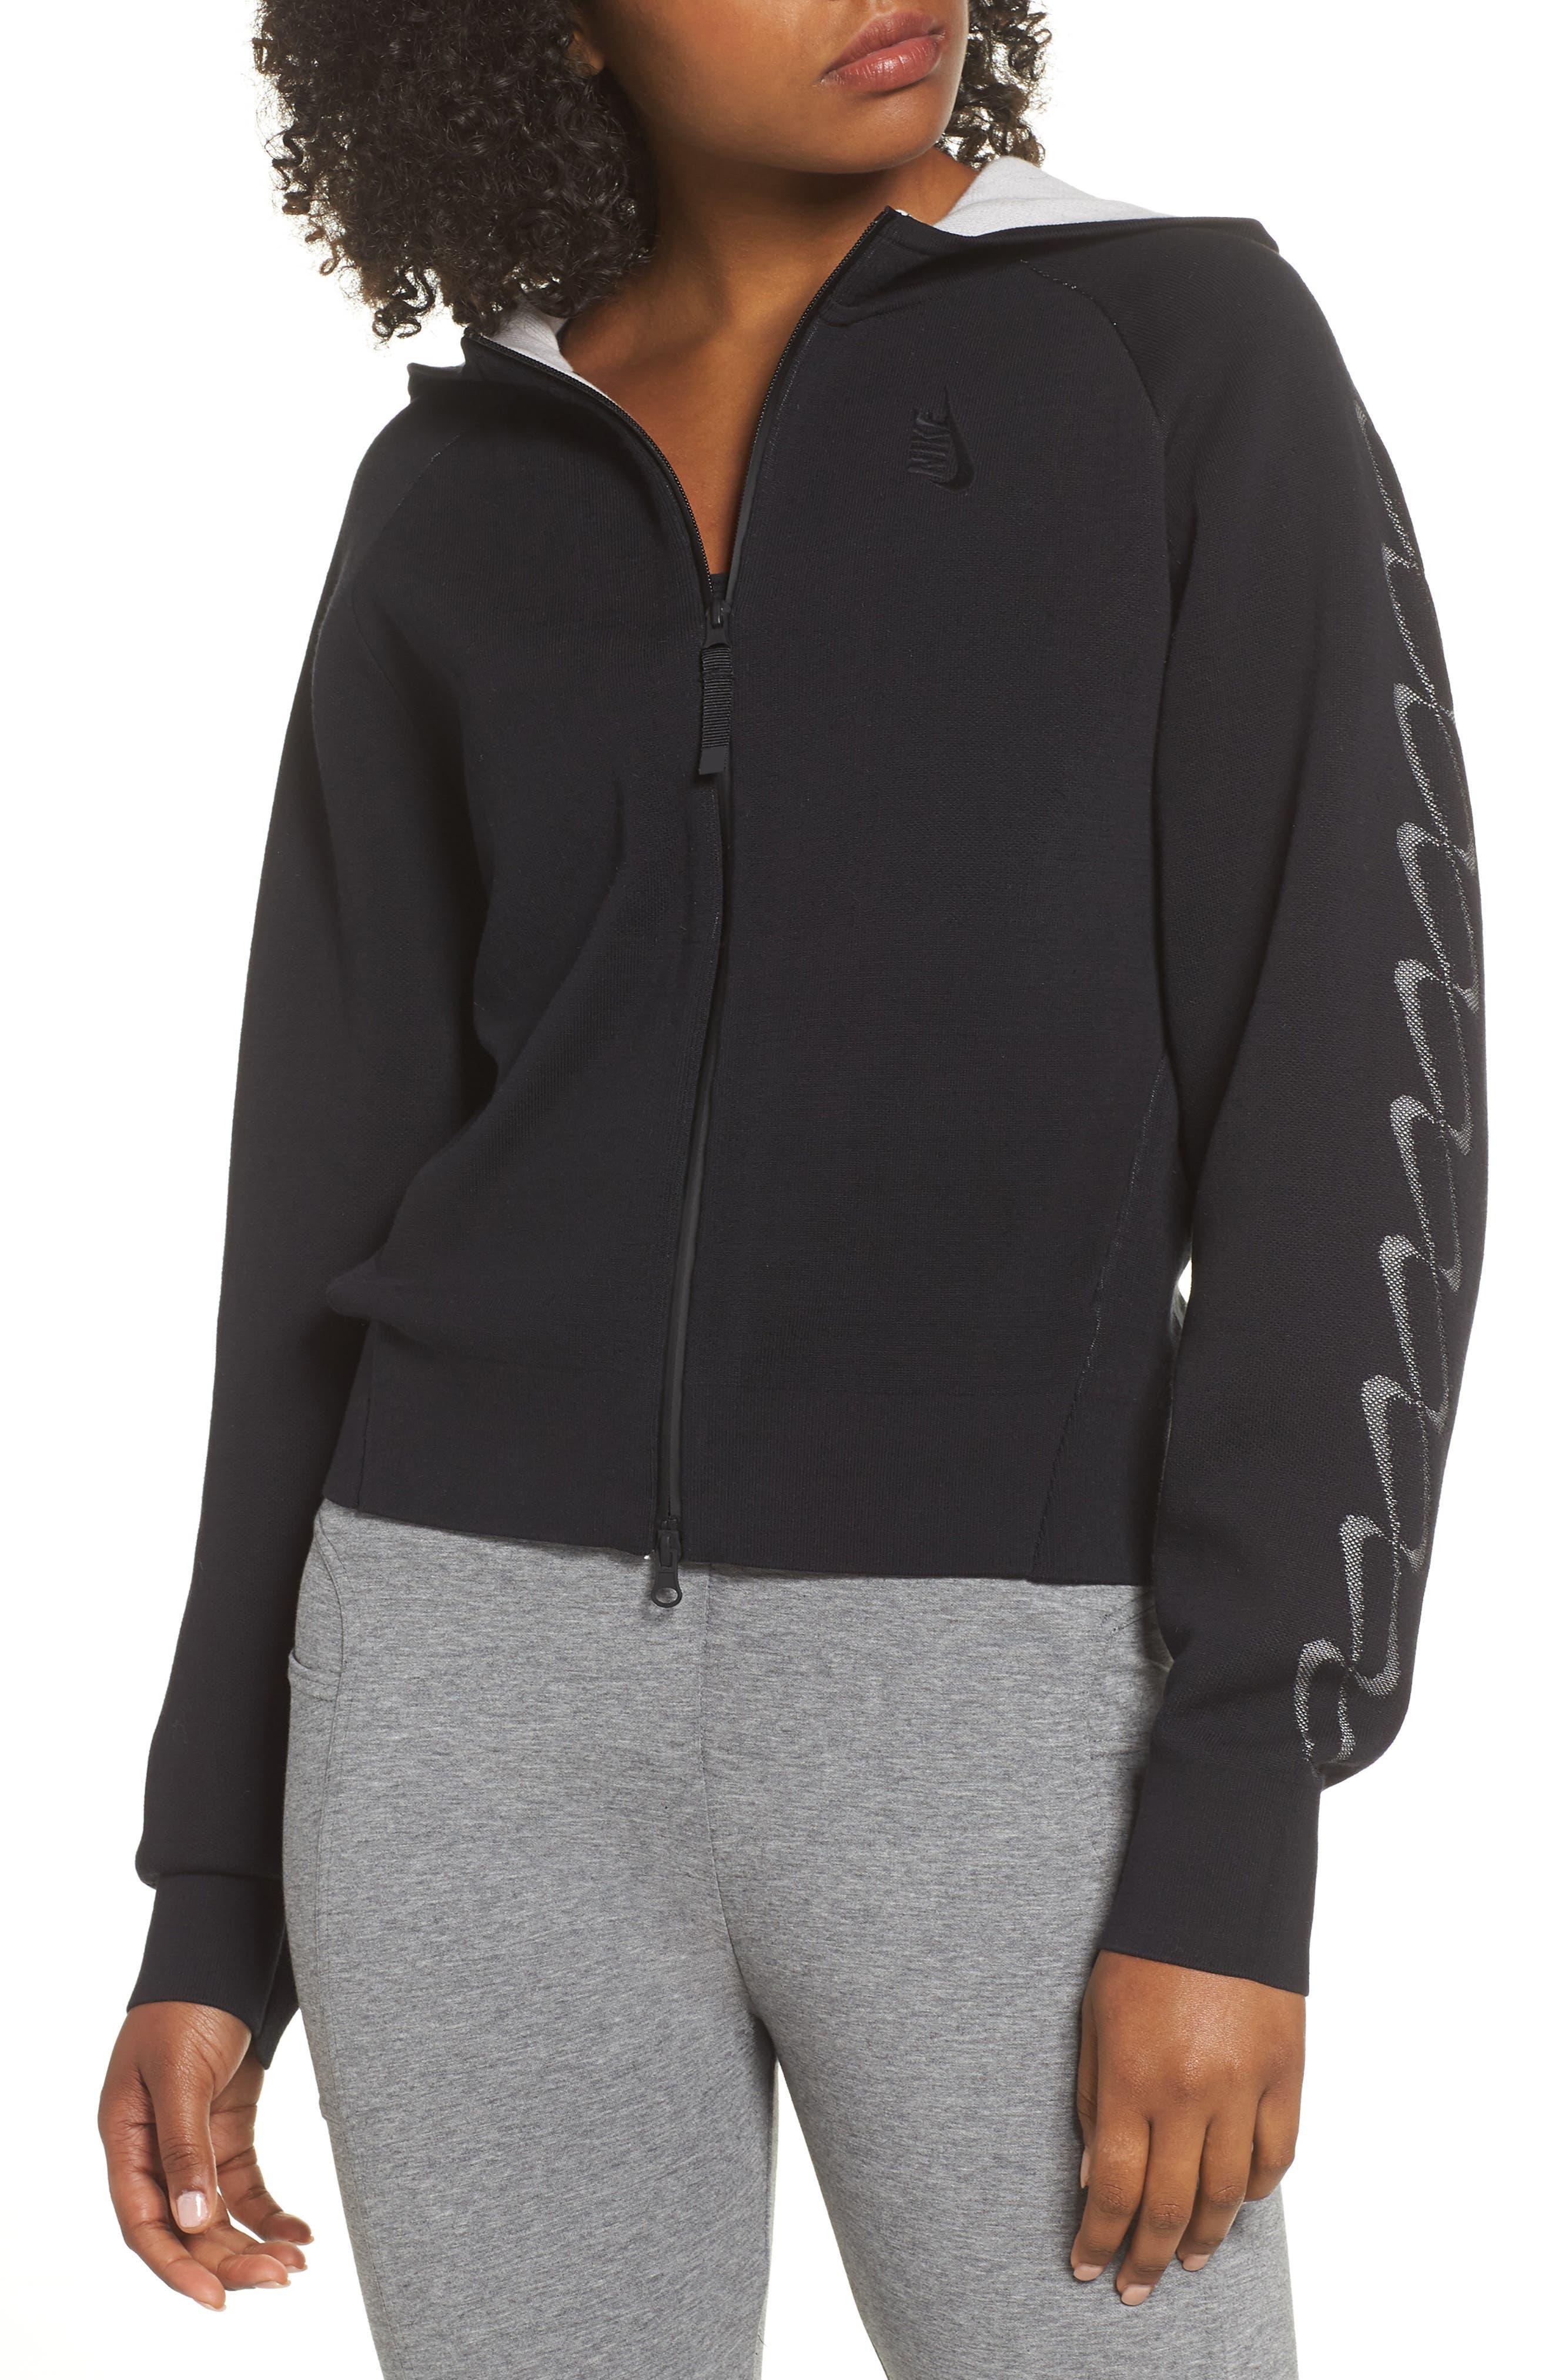 NRG Women's Knit Jacket,                         Main,                         color, Black/ Vast Grey